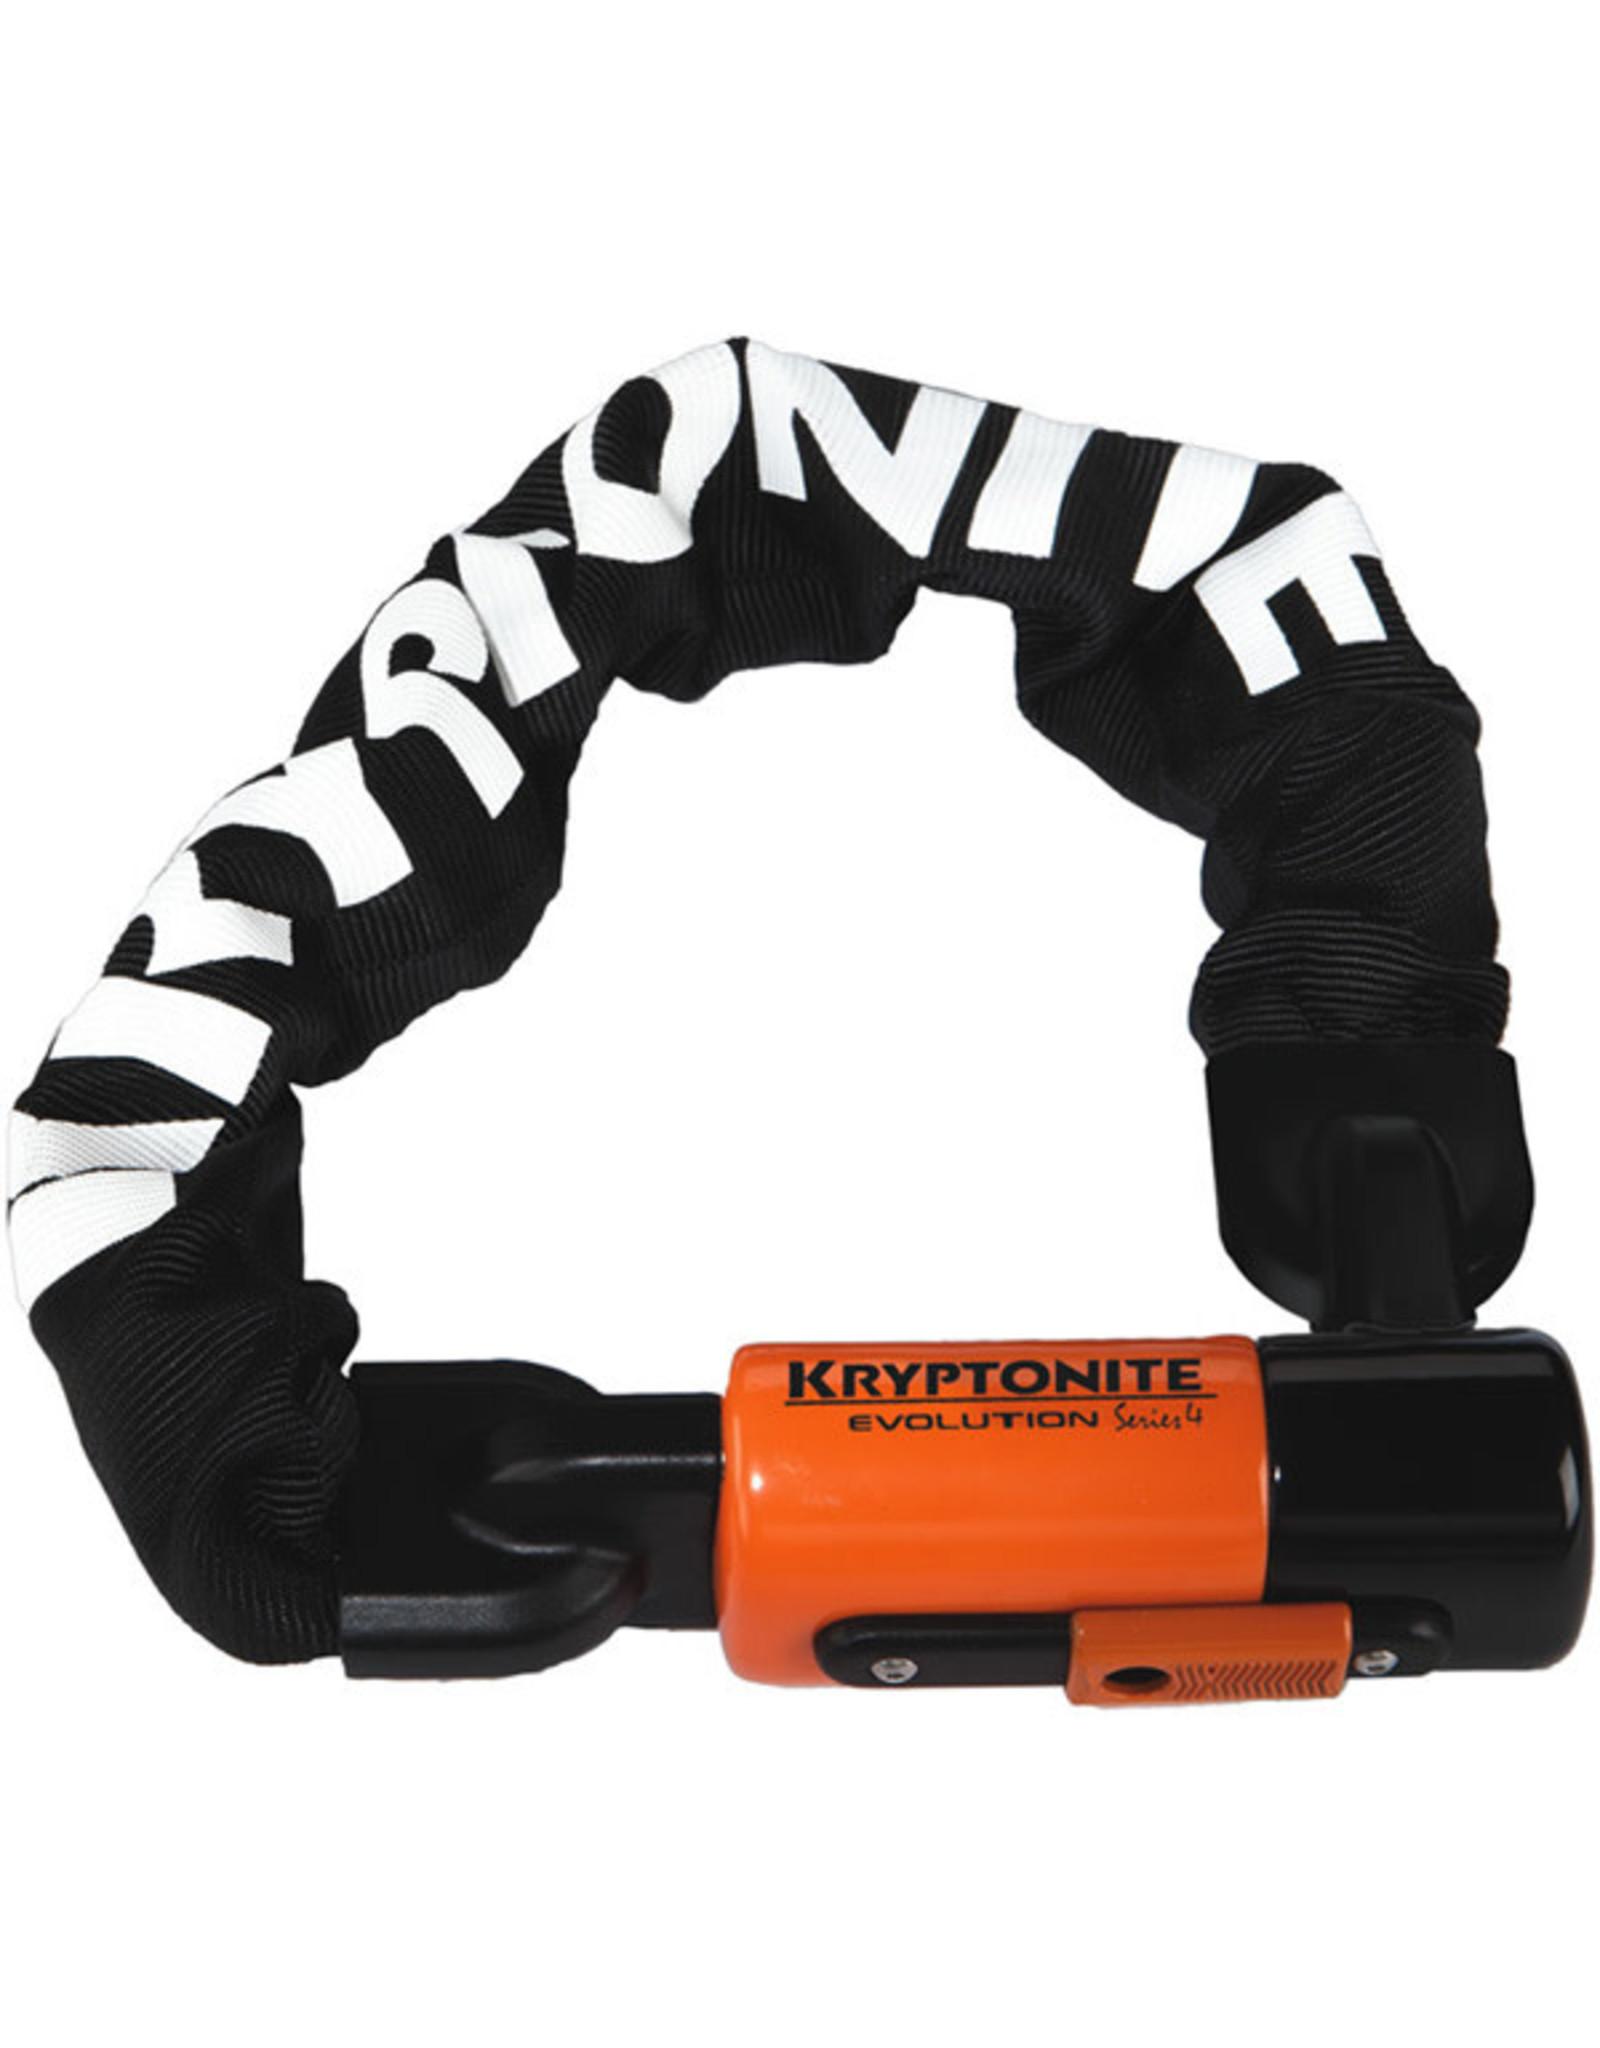 Kryptonite Chain Lock Evolution S4 55cm